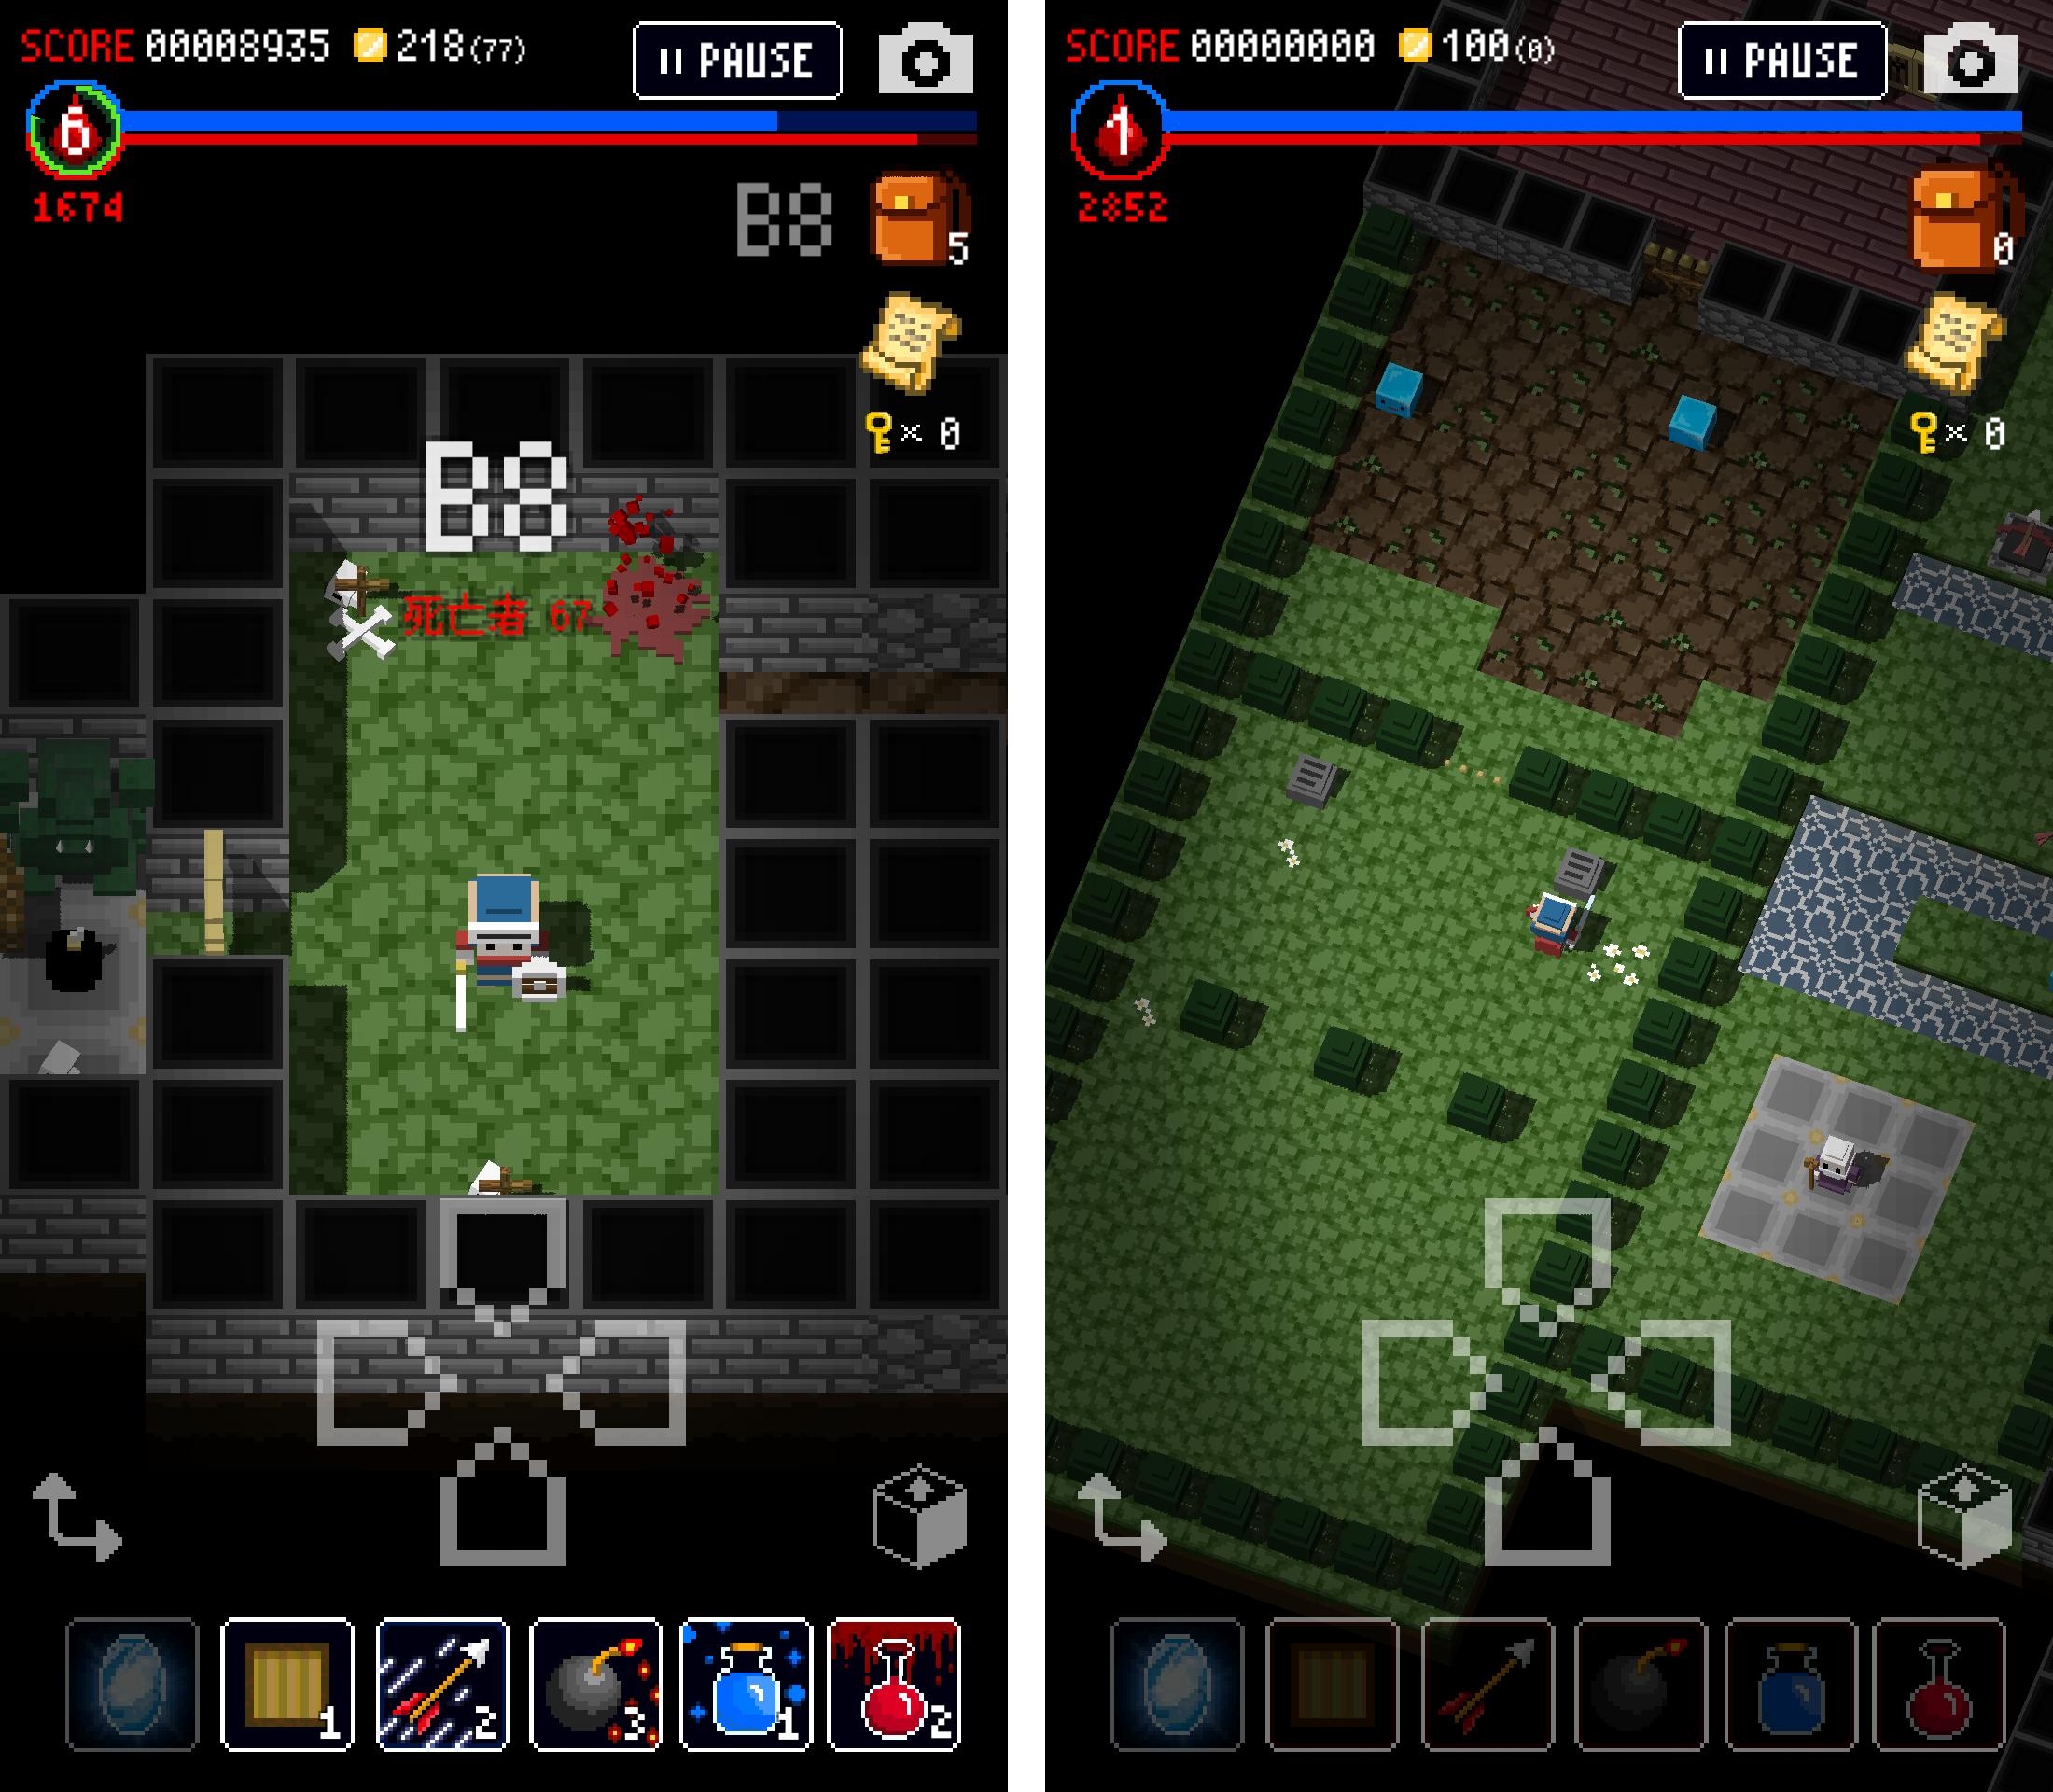 androidアプリ ダンジョンに立つ墓標(Dungeon of Gravestone)攻略スクリーンショット4